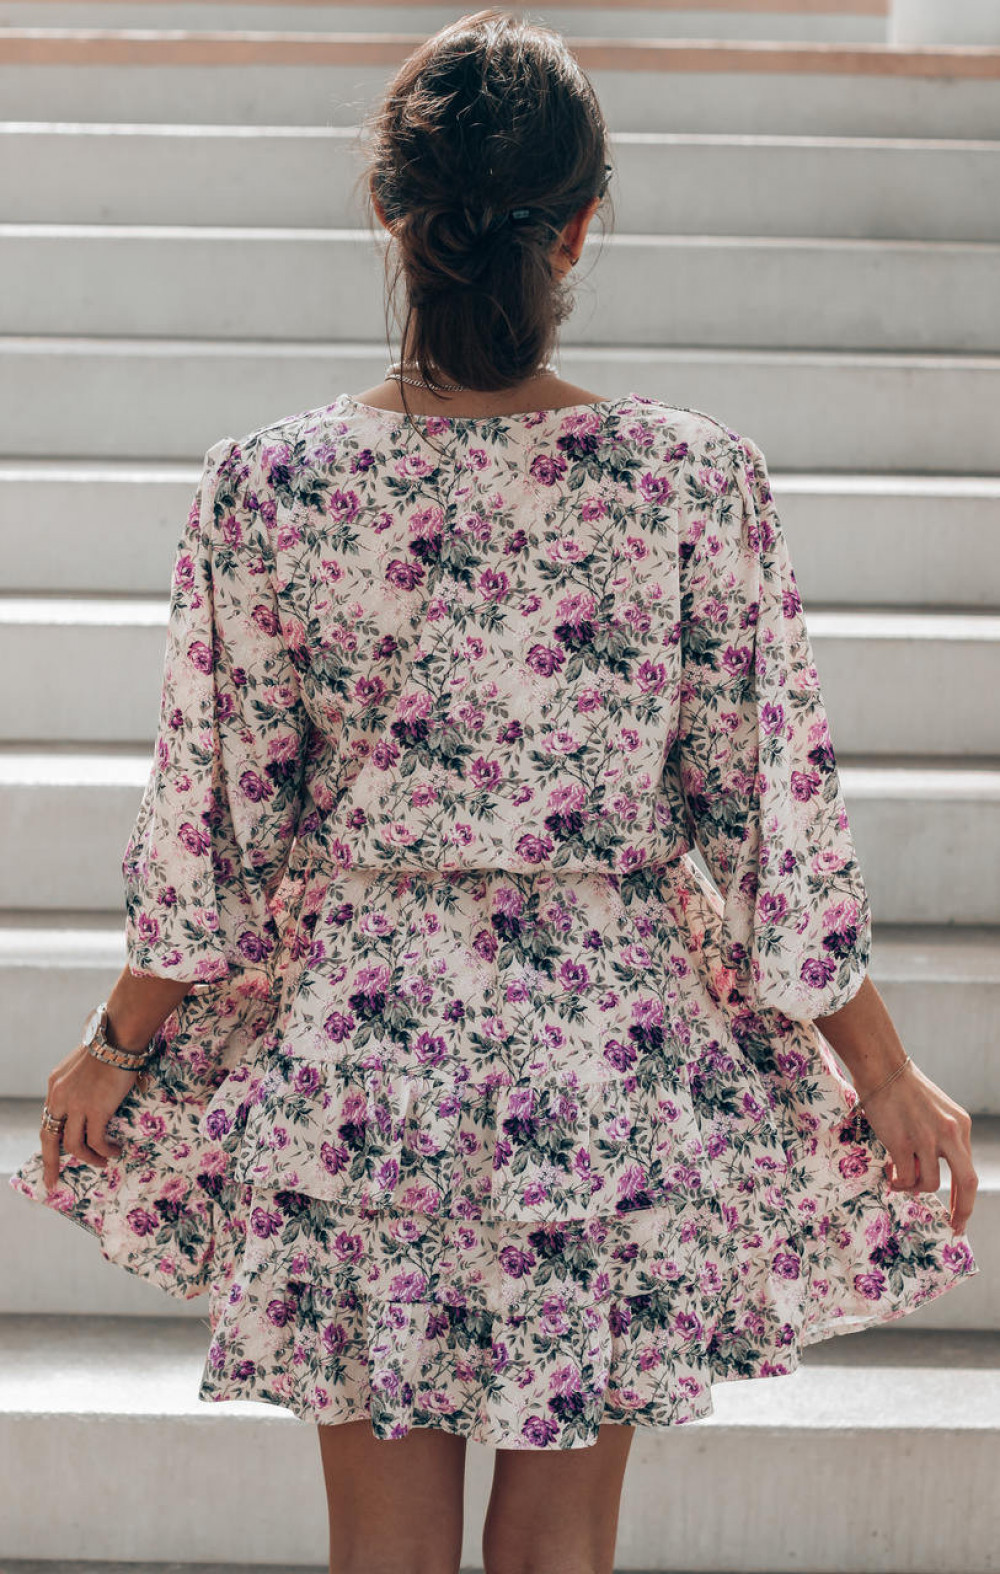 Fioletowa sukienka kwiatowa rozkloszowana z falbankami Abella 4